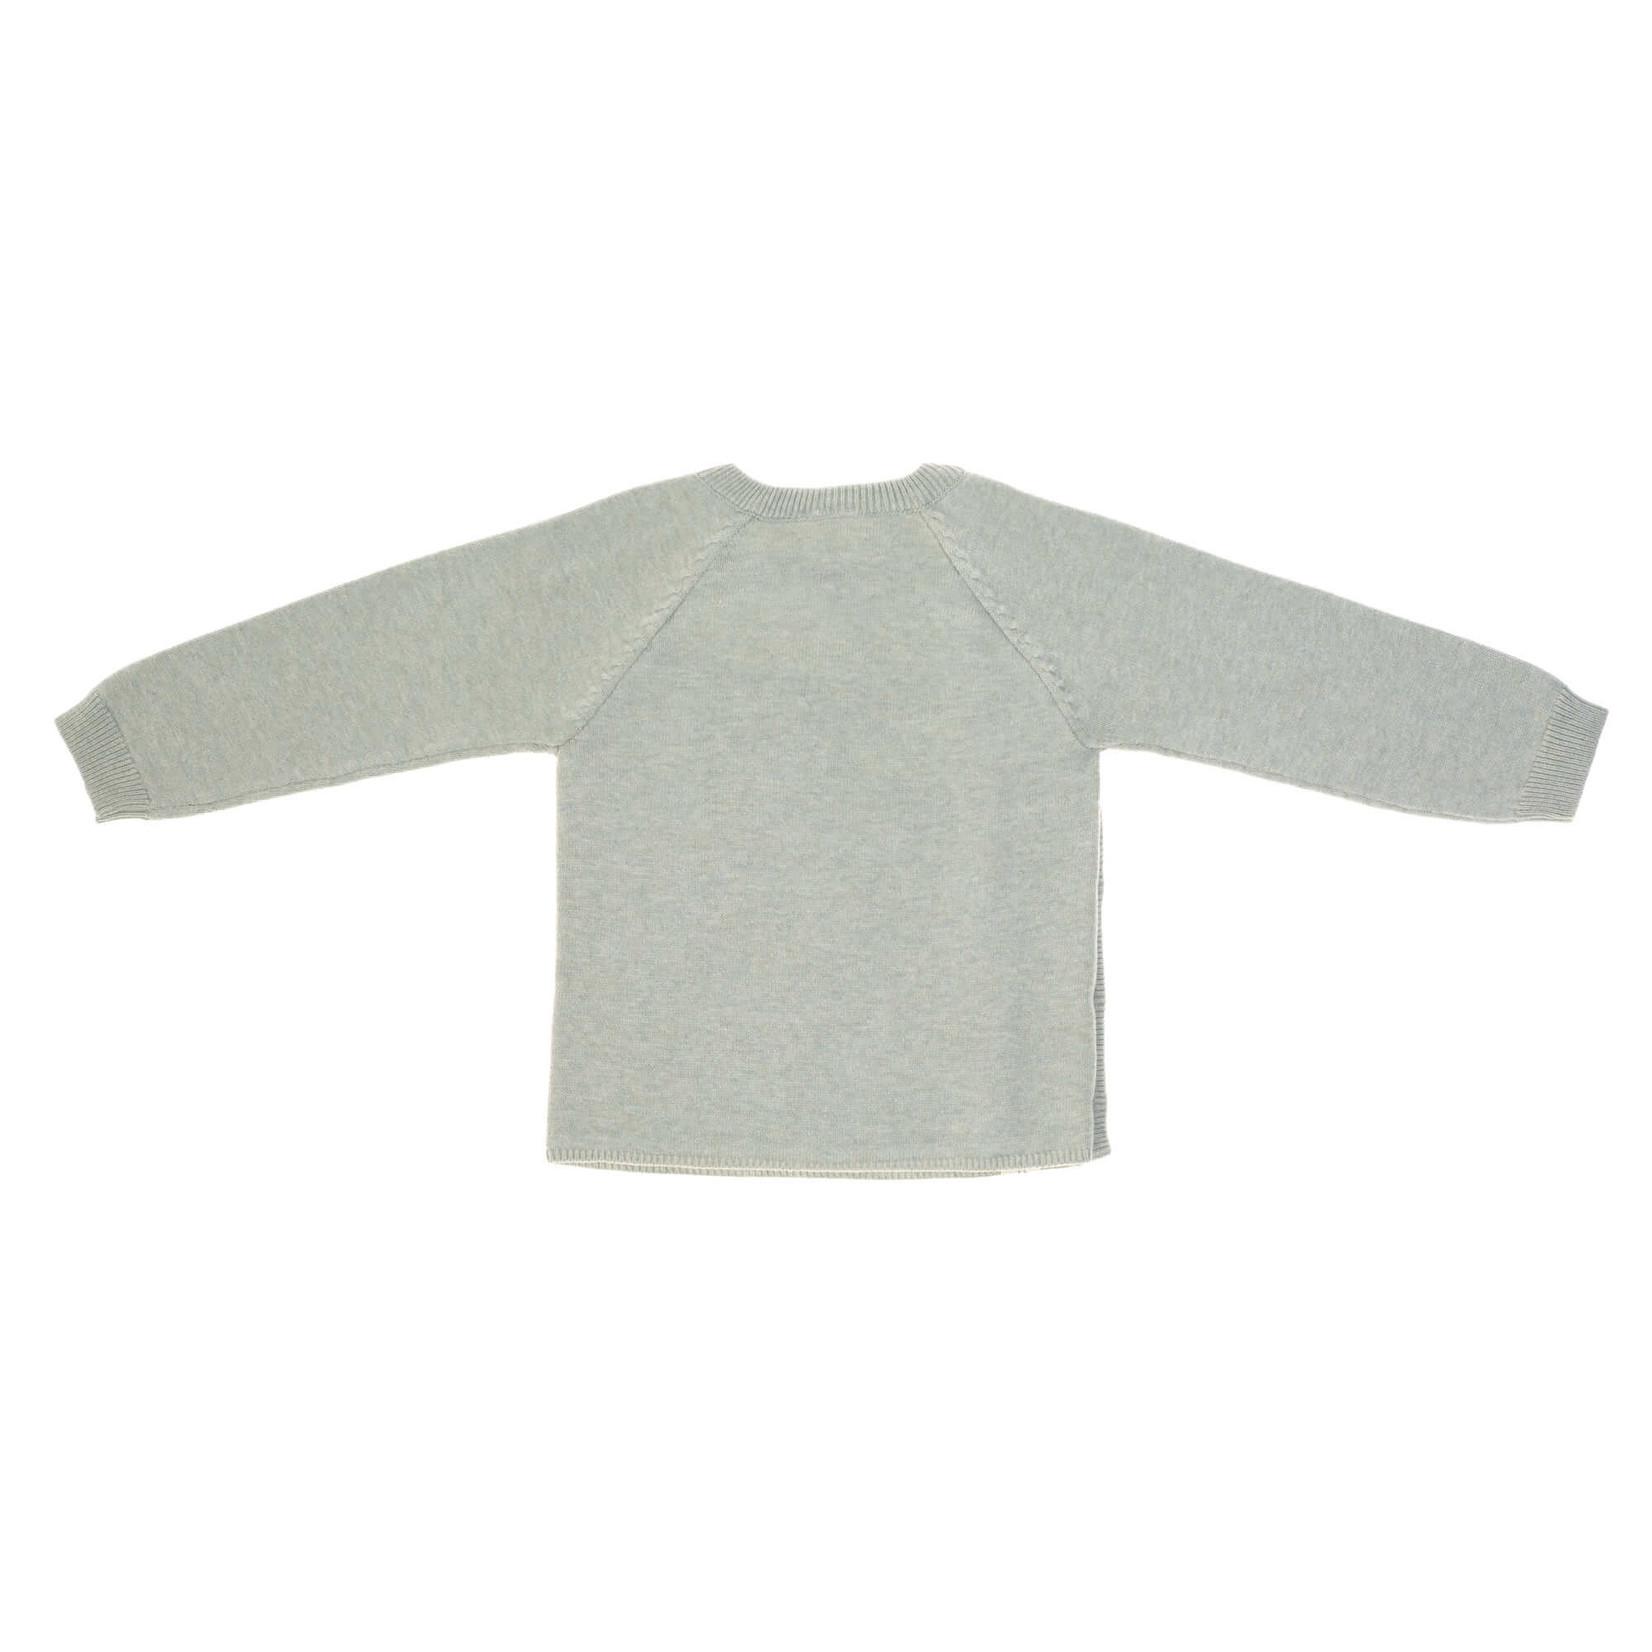 Lässig Knitted Kimono Gots  Garden Explorer  Aqua Grey